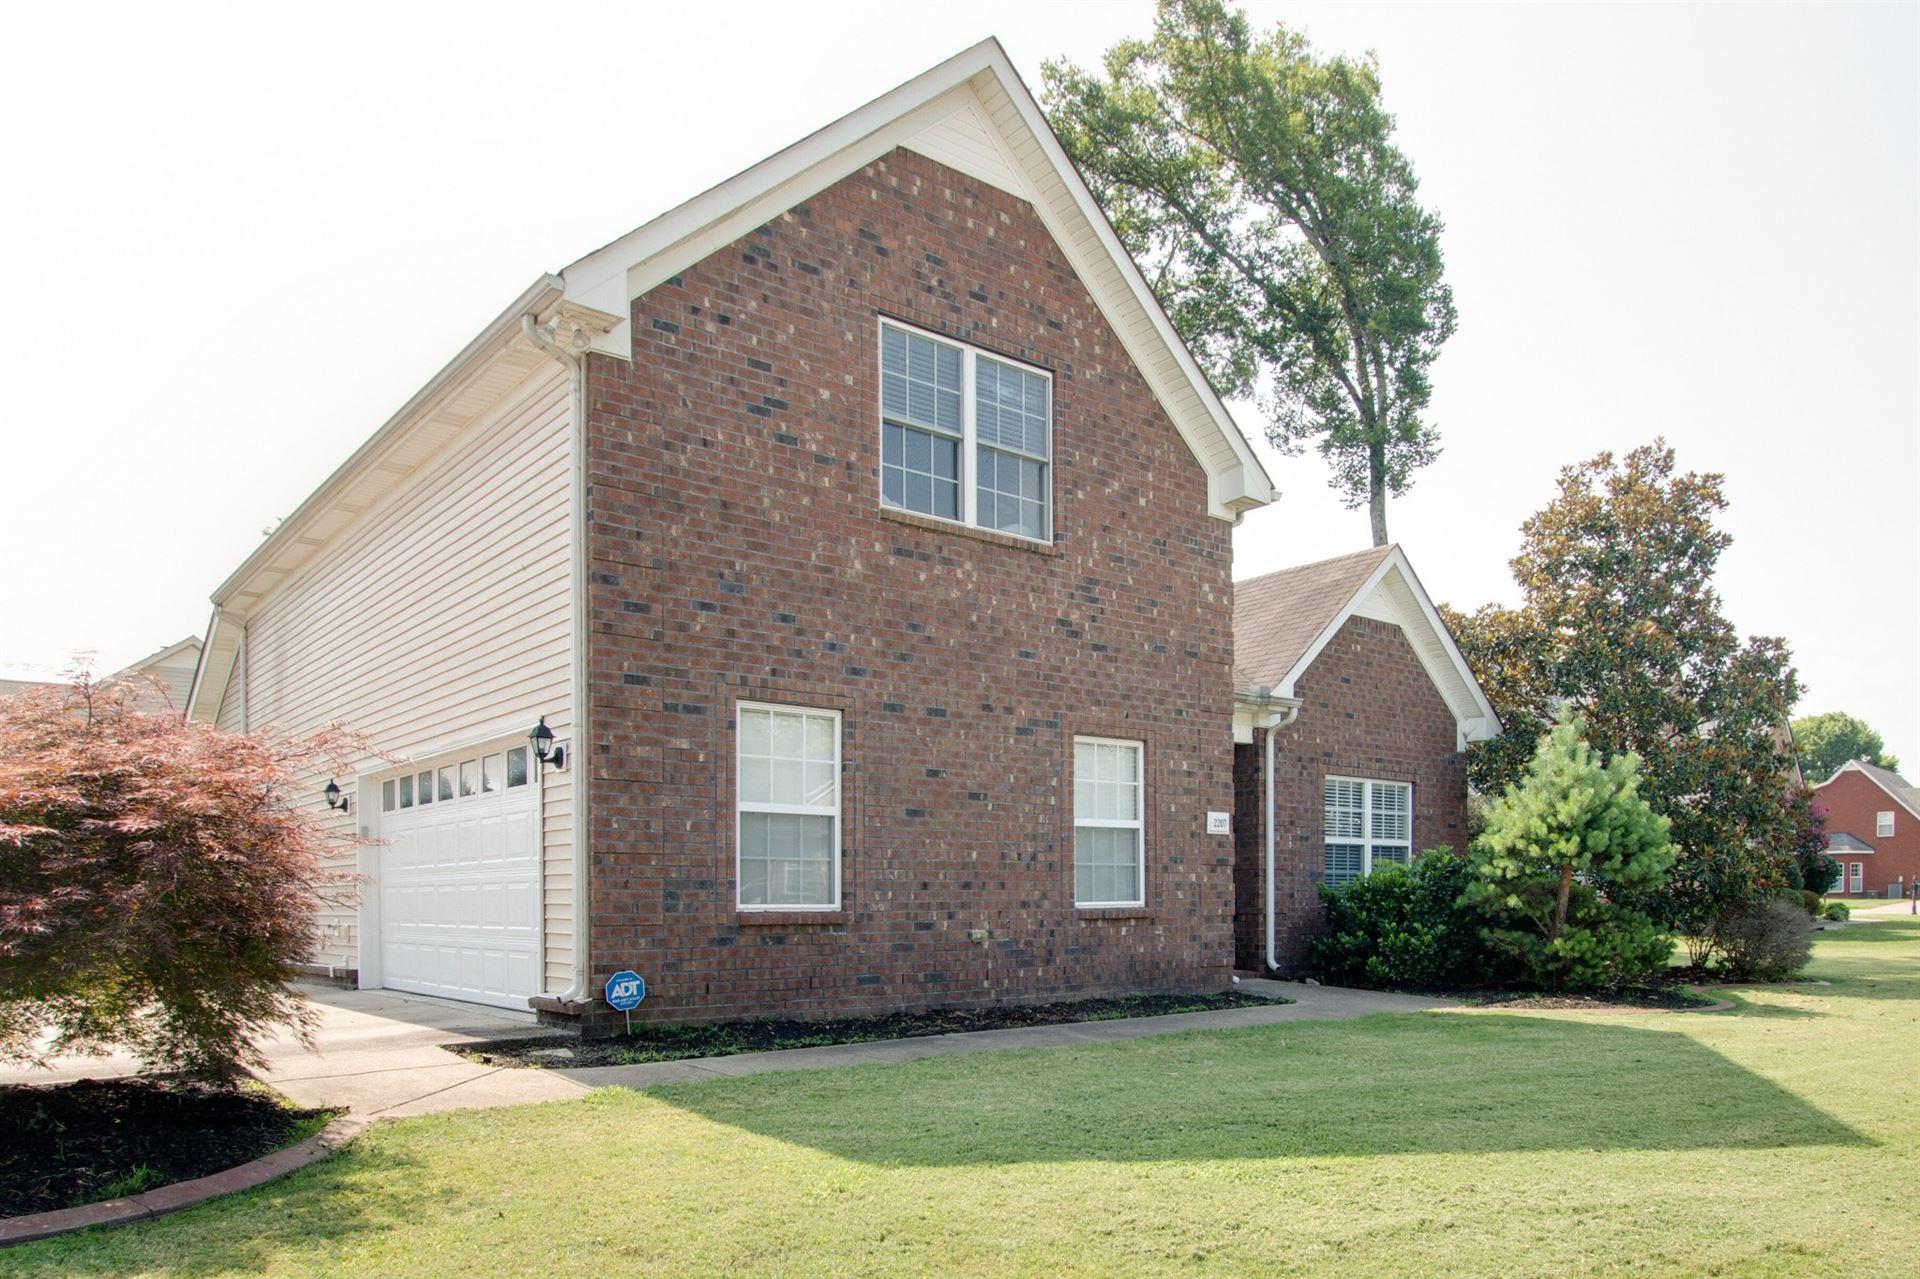 2207 Saint Andrews Dr, Murfreesboro, TN 37128 - MLS#: 2273053